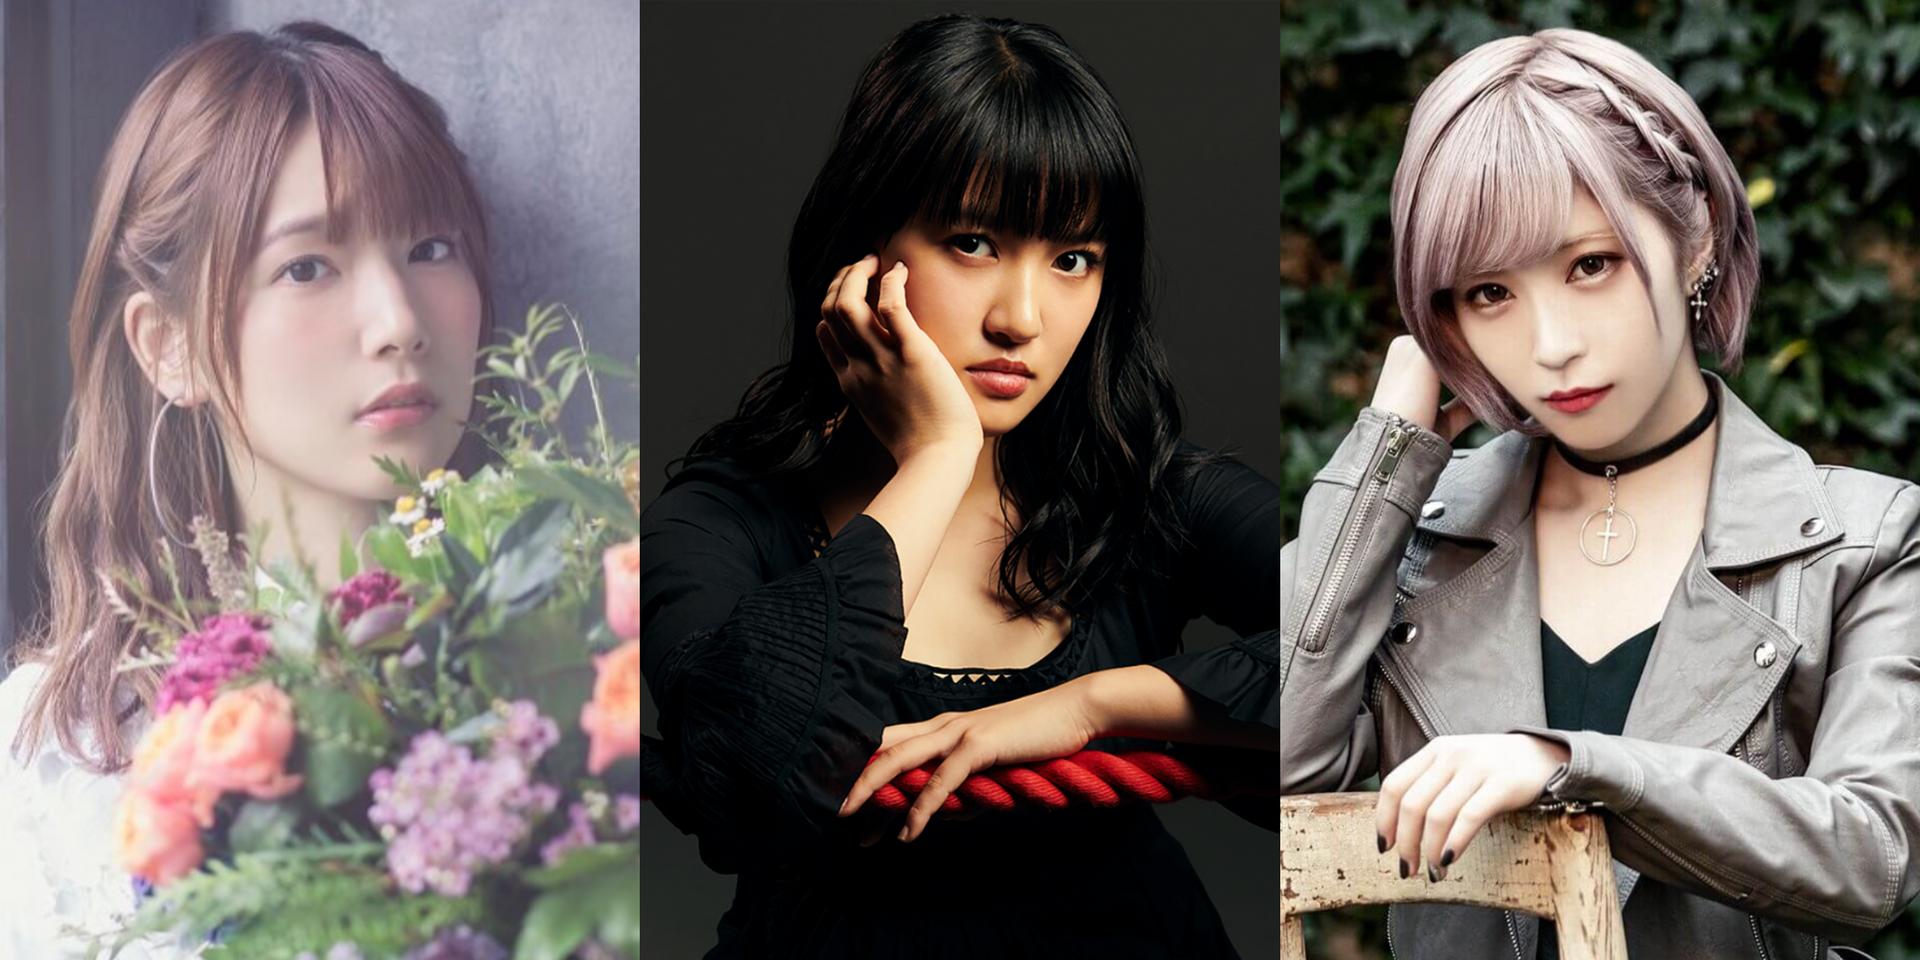 C3 Anime Festival Asia 2019 announces Singapore line-up – Maaya Uchida, JUNNA, ReoNa and more to perform